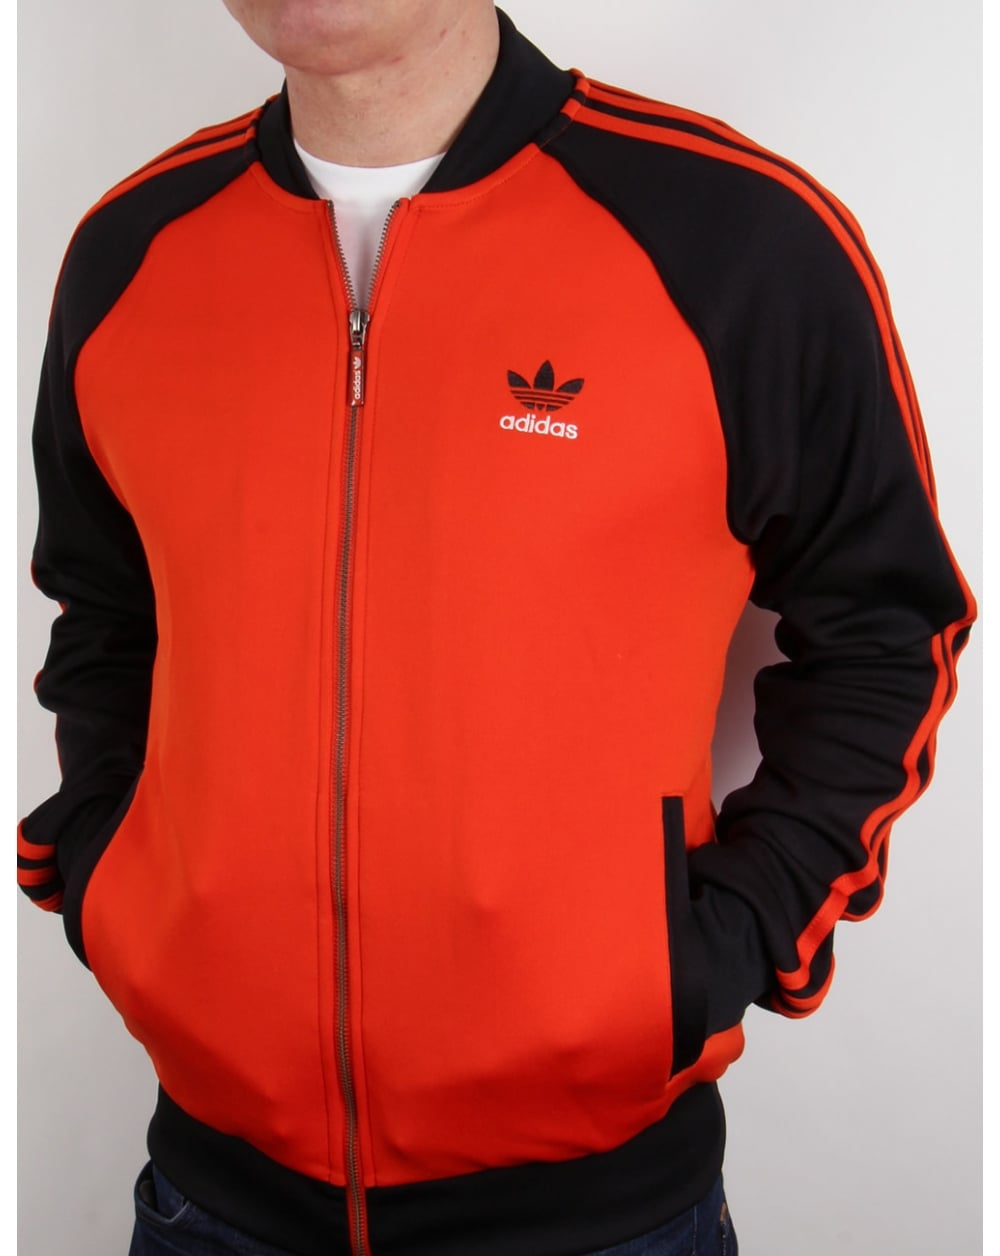 Adidas Originals Para Hombre Spo Superior Pista Súper Estrella - Rojo Negro lCYNuj